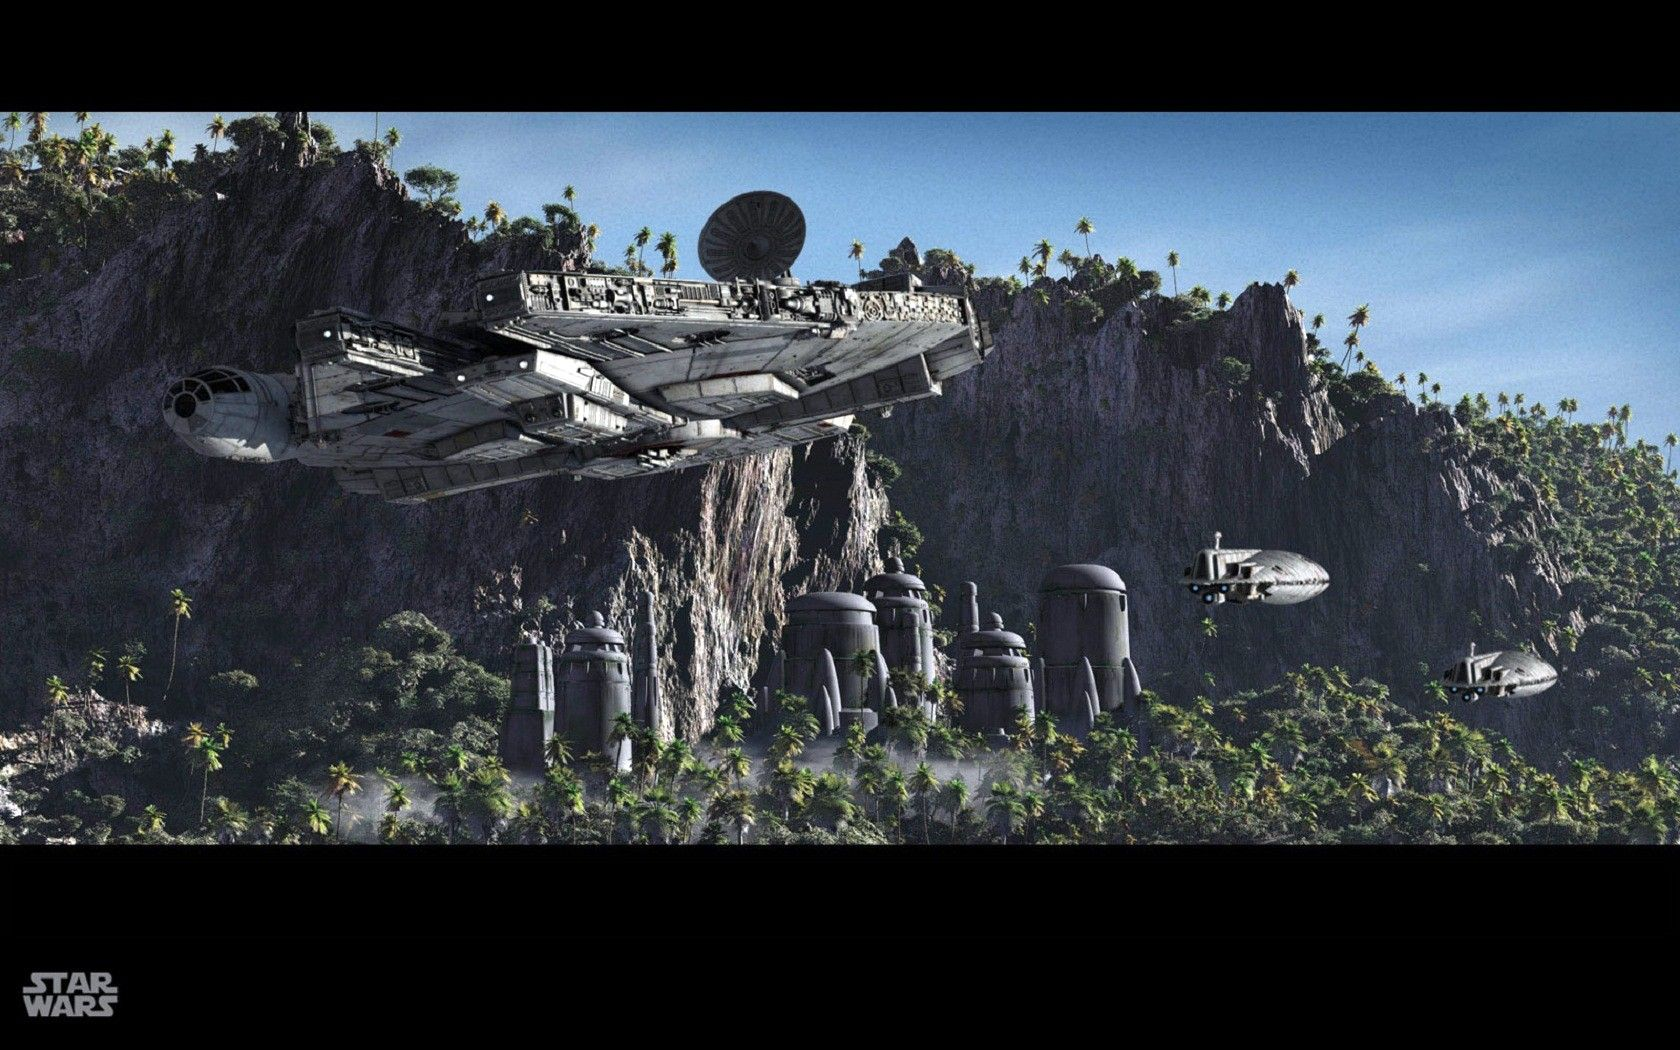 Star Wars Wallpapers 1680x1050 1680x1050